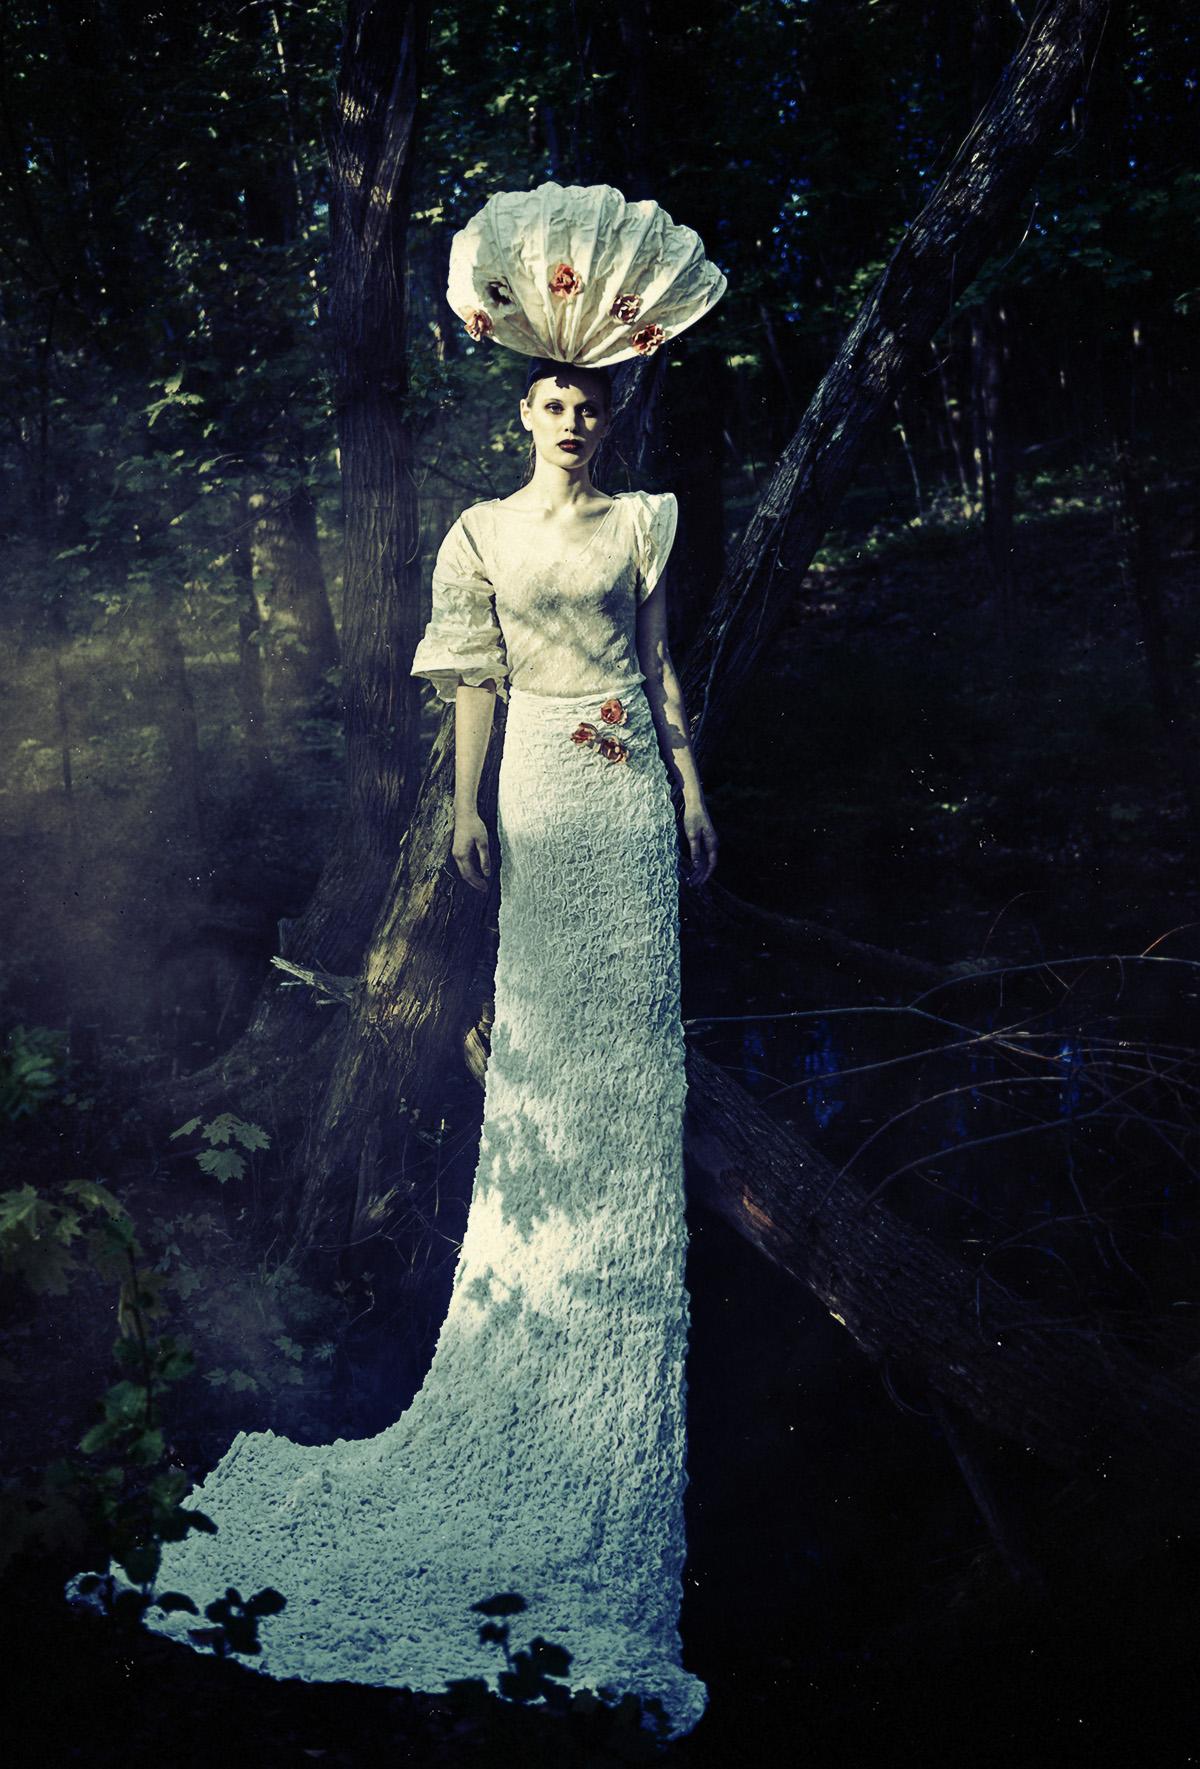 Simple-T Photography - Hydrangea's Kingdom